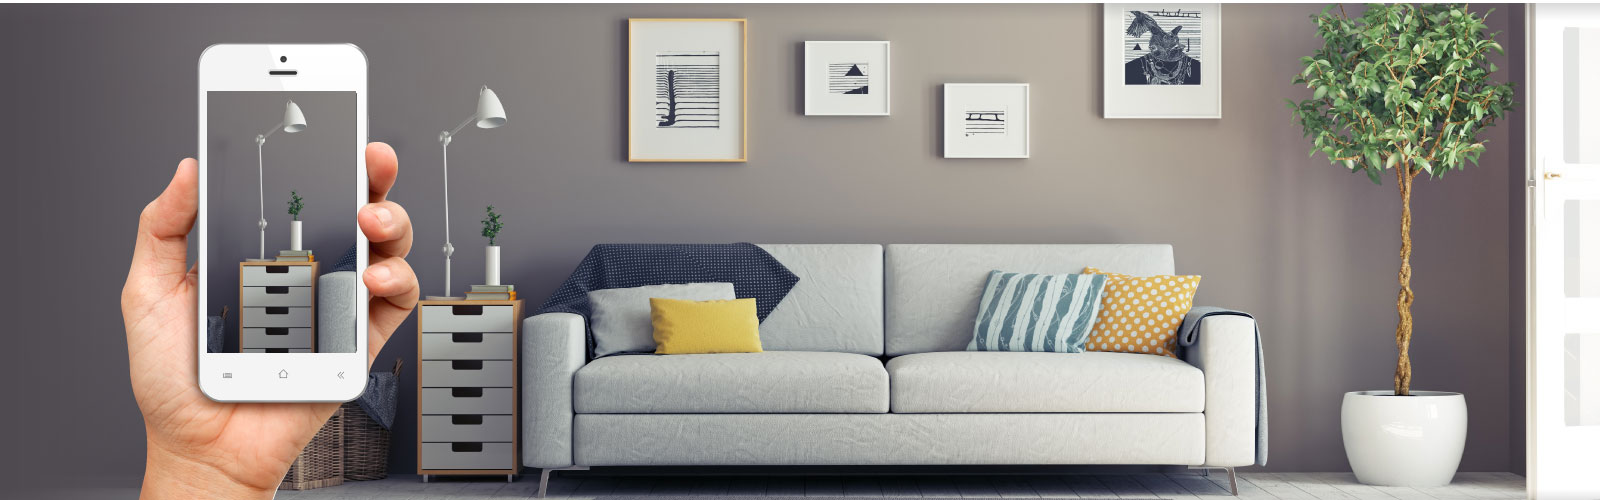 smartphone-living-room